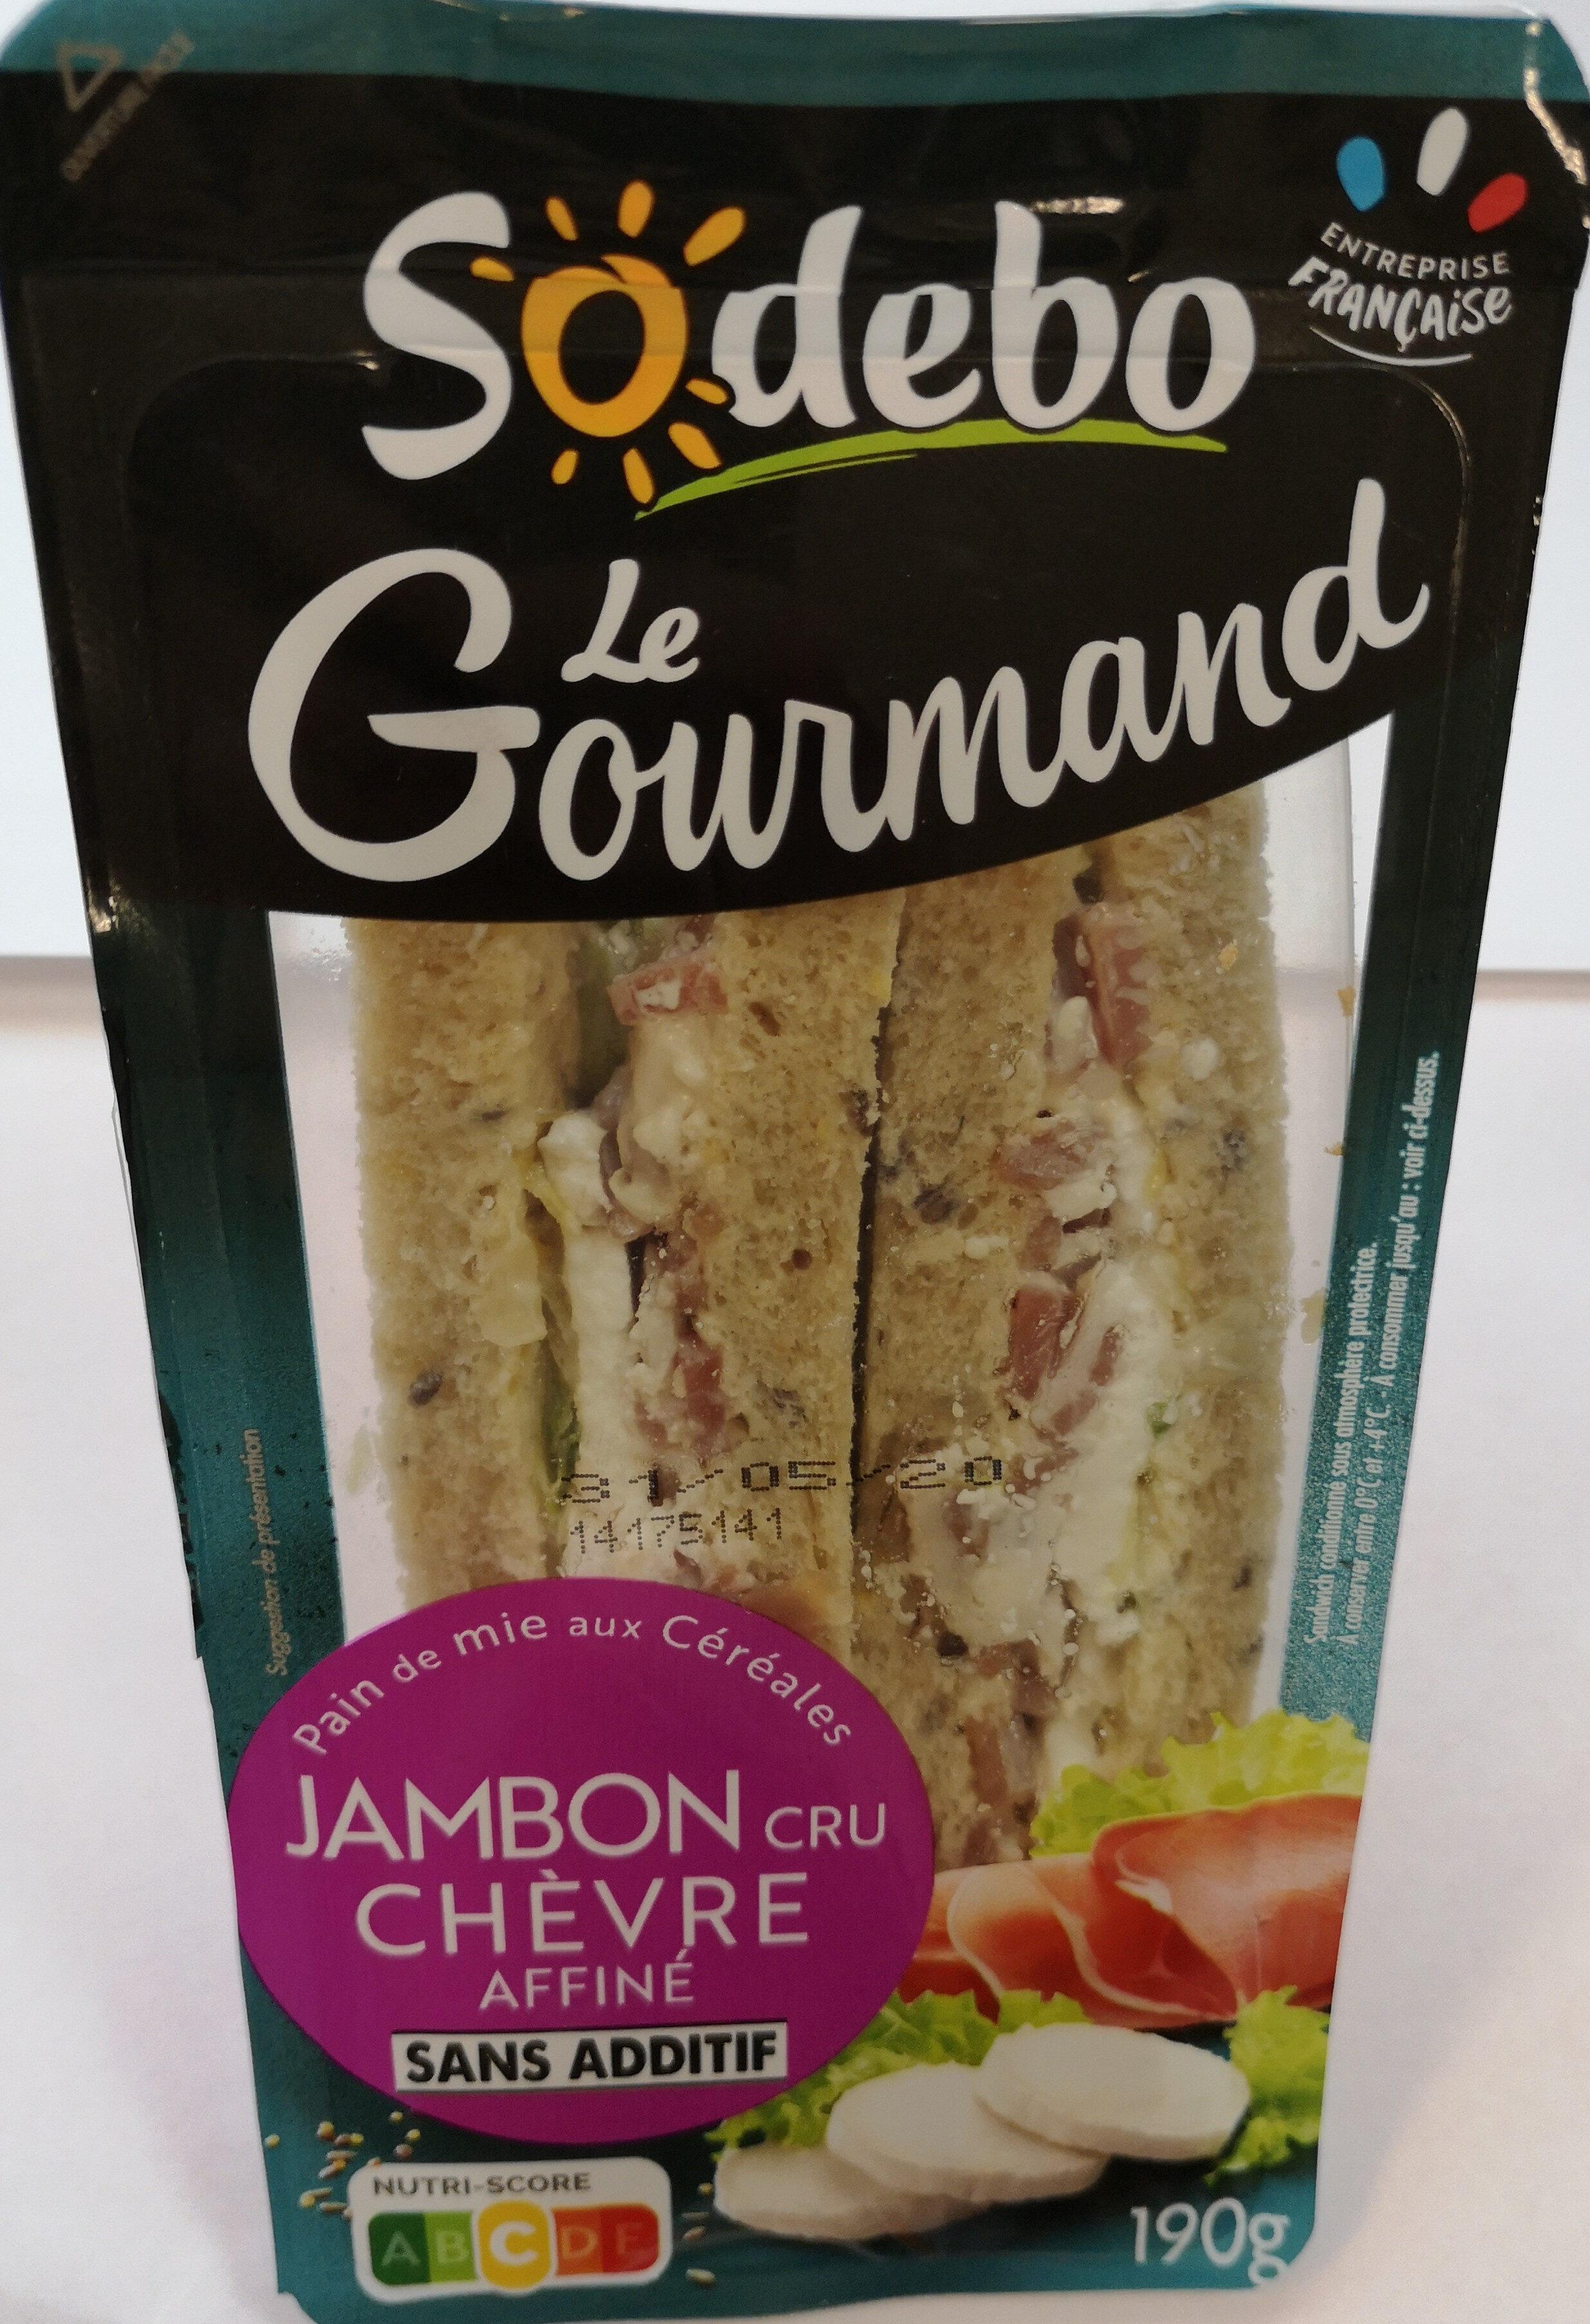 Sandwich Le Gourmand Club - Jambon cru Chèvre - Product - fr